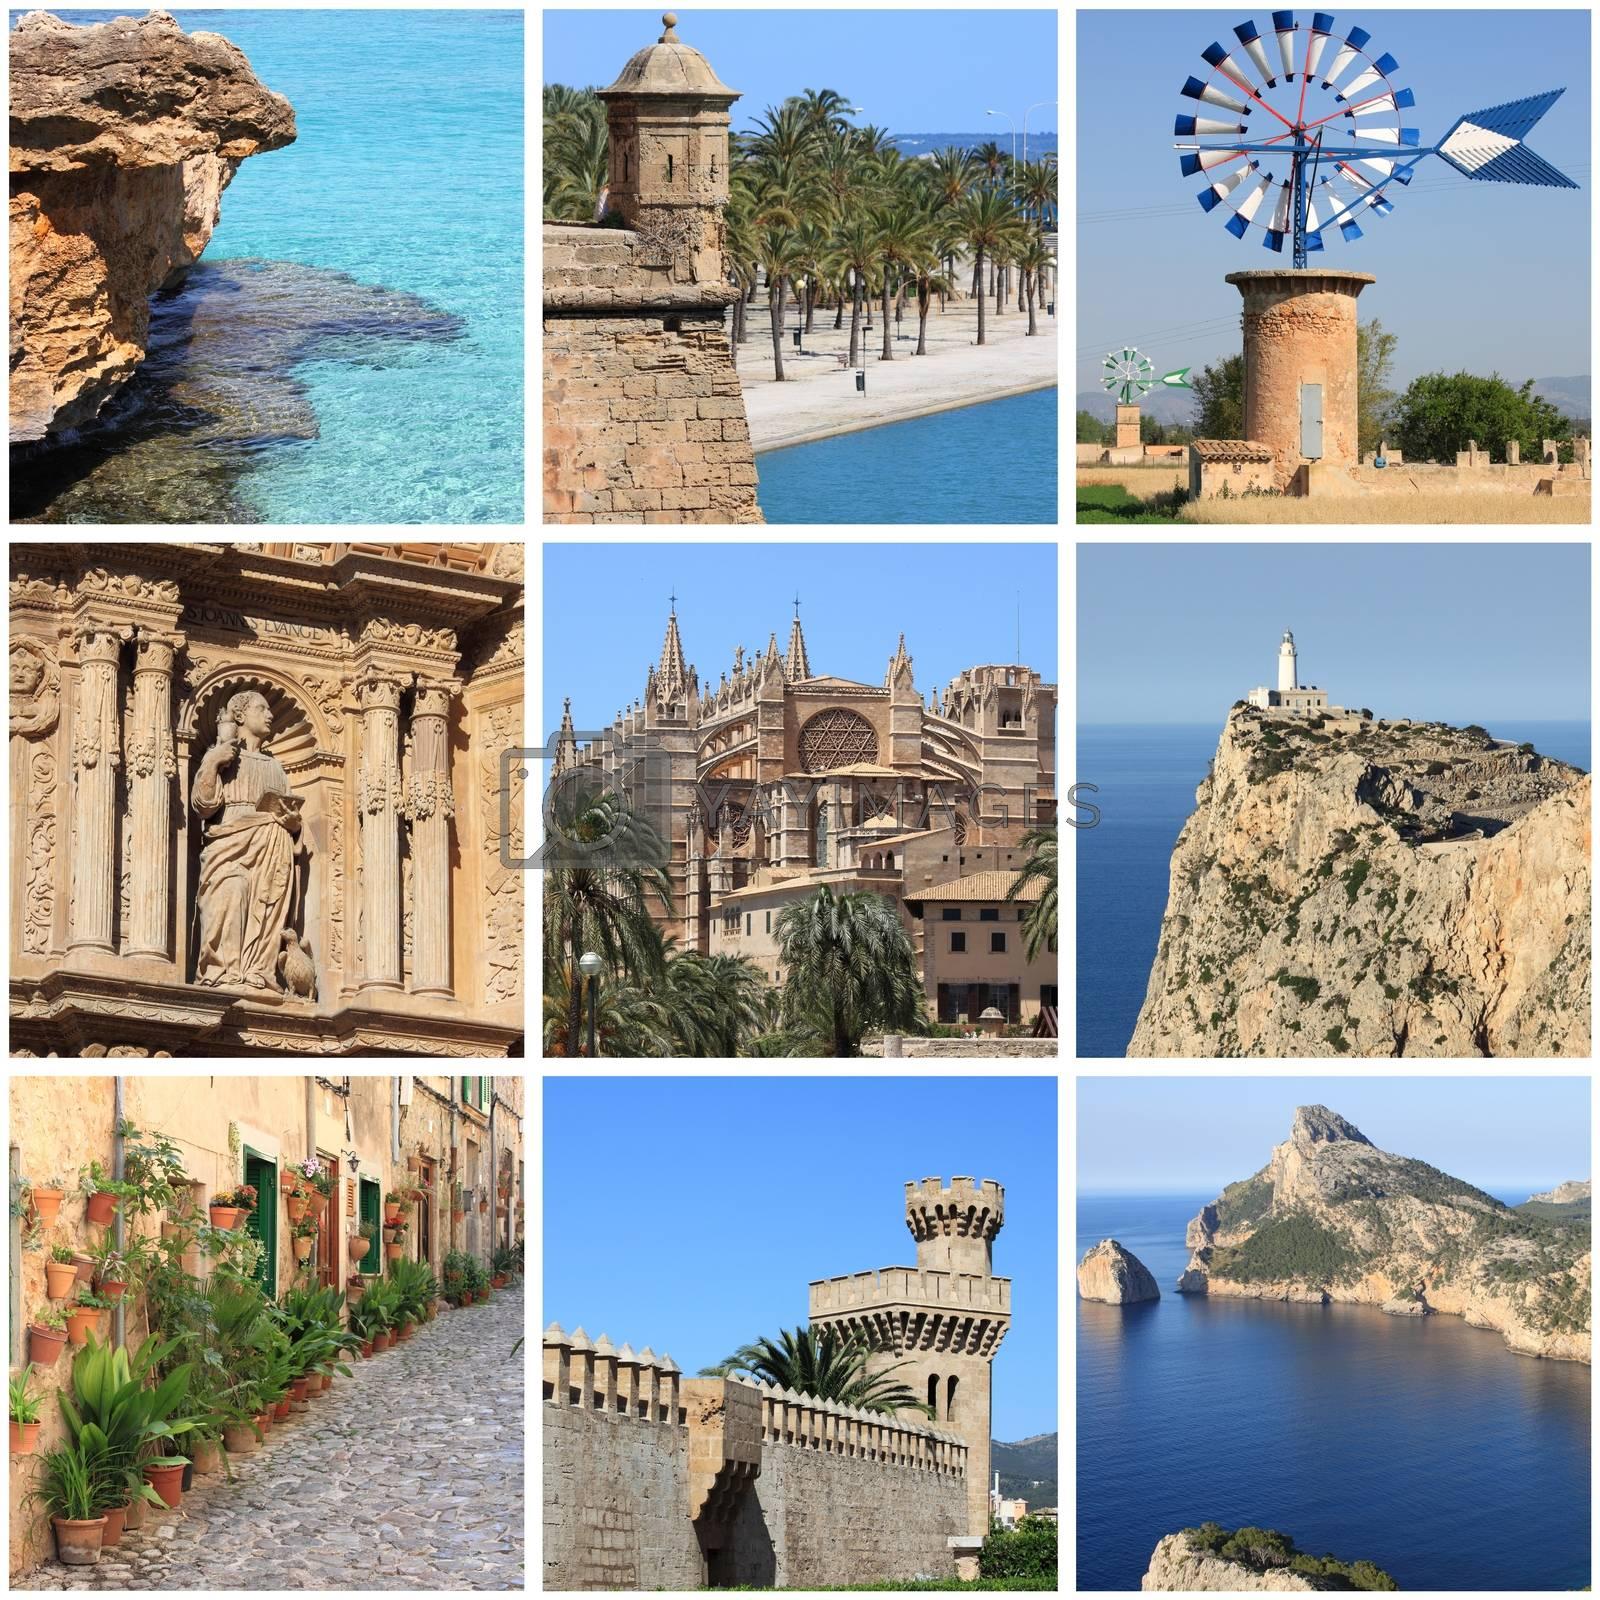 Mallorca Island landmarks collage by alessandro0770